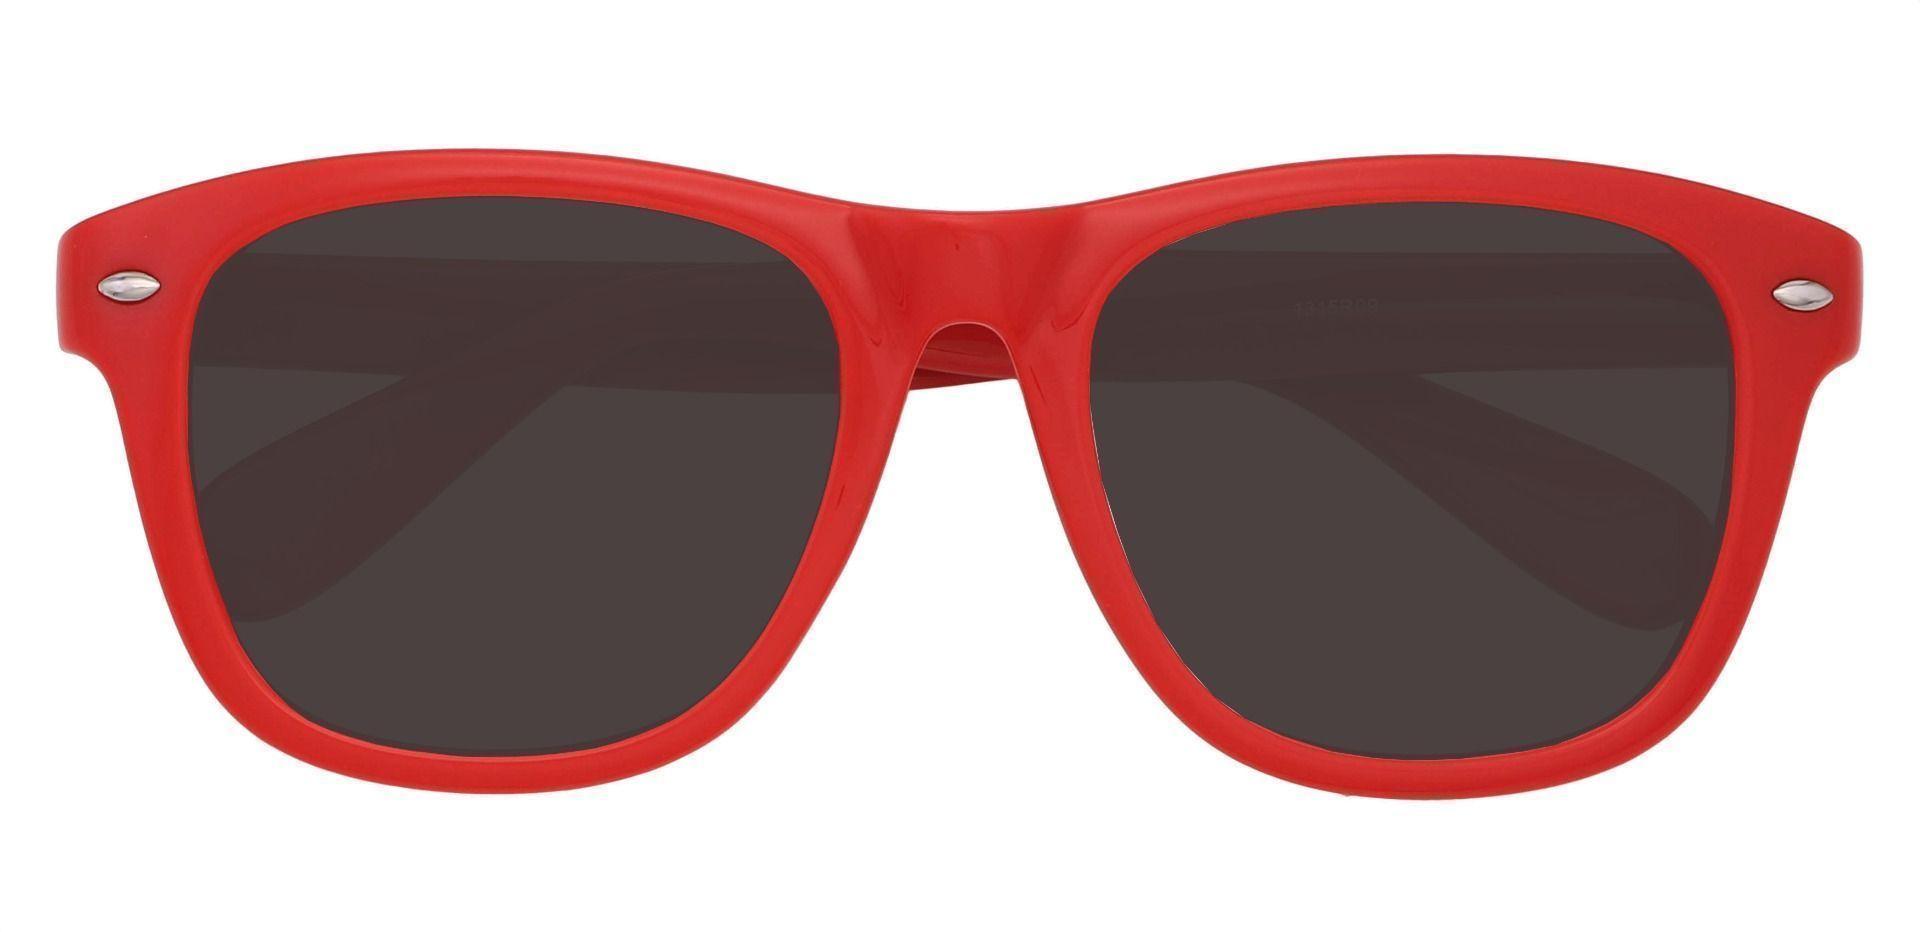 Yolanda Square Prescription Sunglasses - Red Frame With Gray Lenses